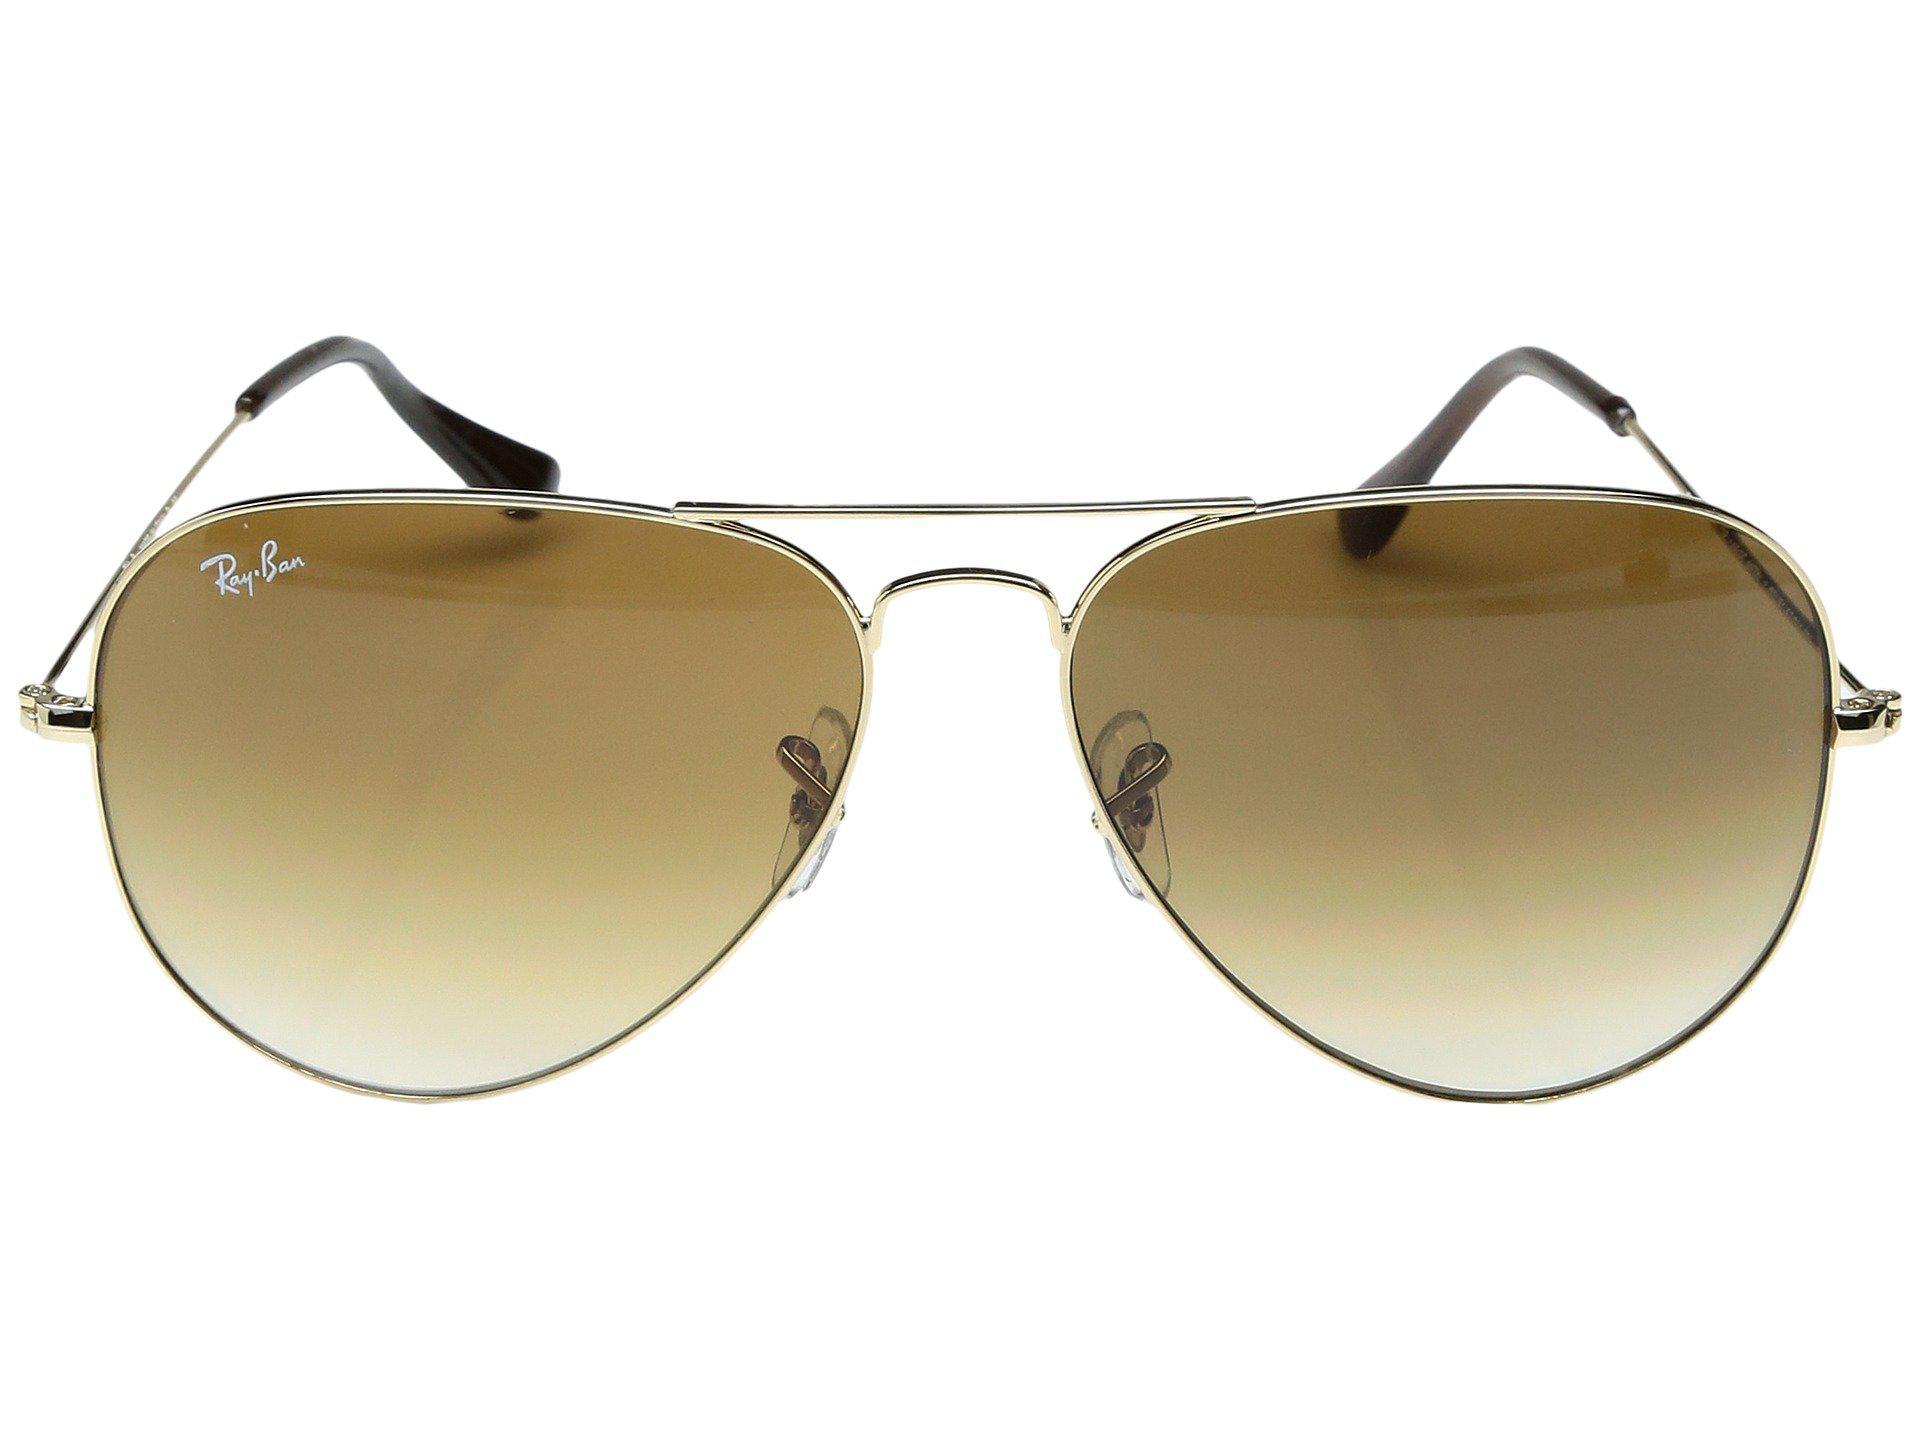 013eaa8143965 Ray-Ban - Metallic Rb3025 Original Aviator 62mm (gold crystal Brown Gradient).  View fullscreen